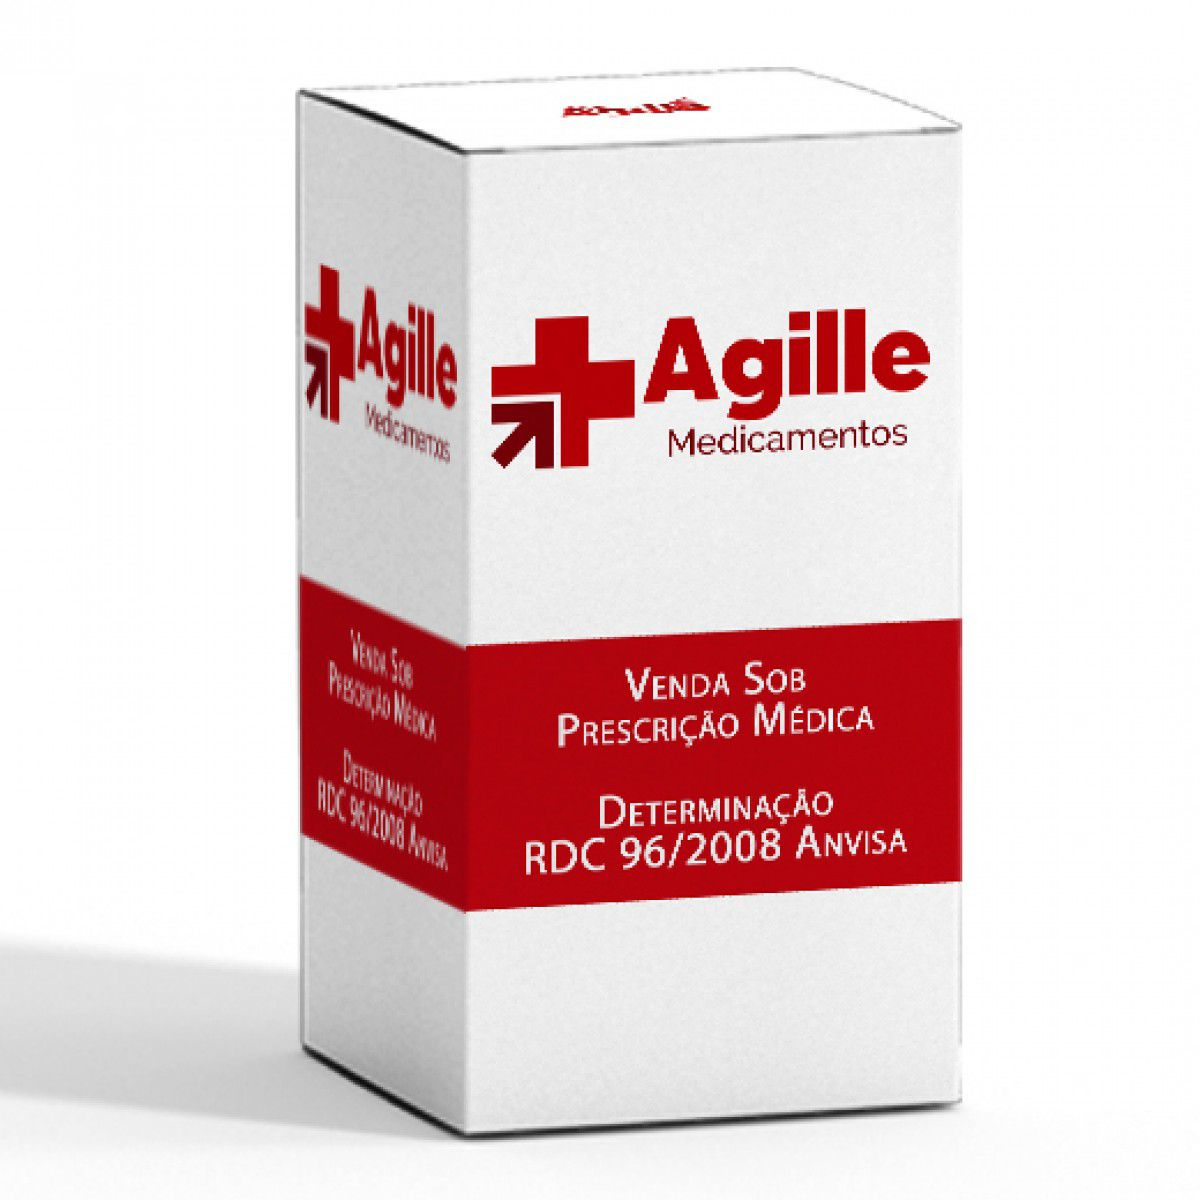 CICLOSPORINA M EMULSAO 25MG (C/50)  - Agille Speciality